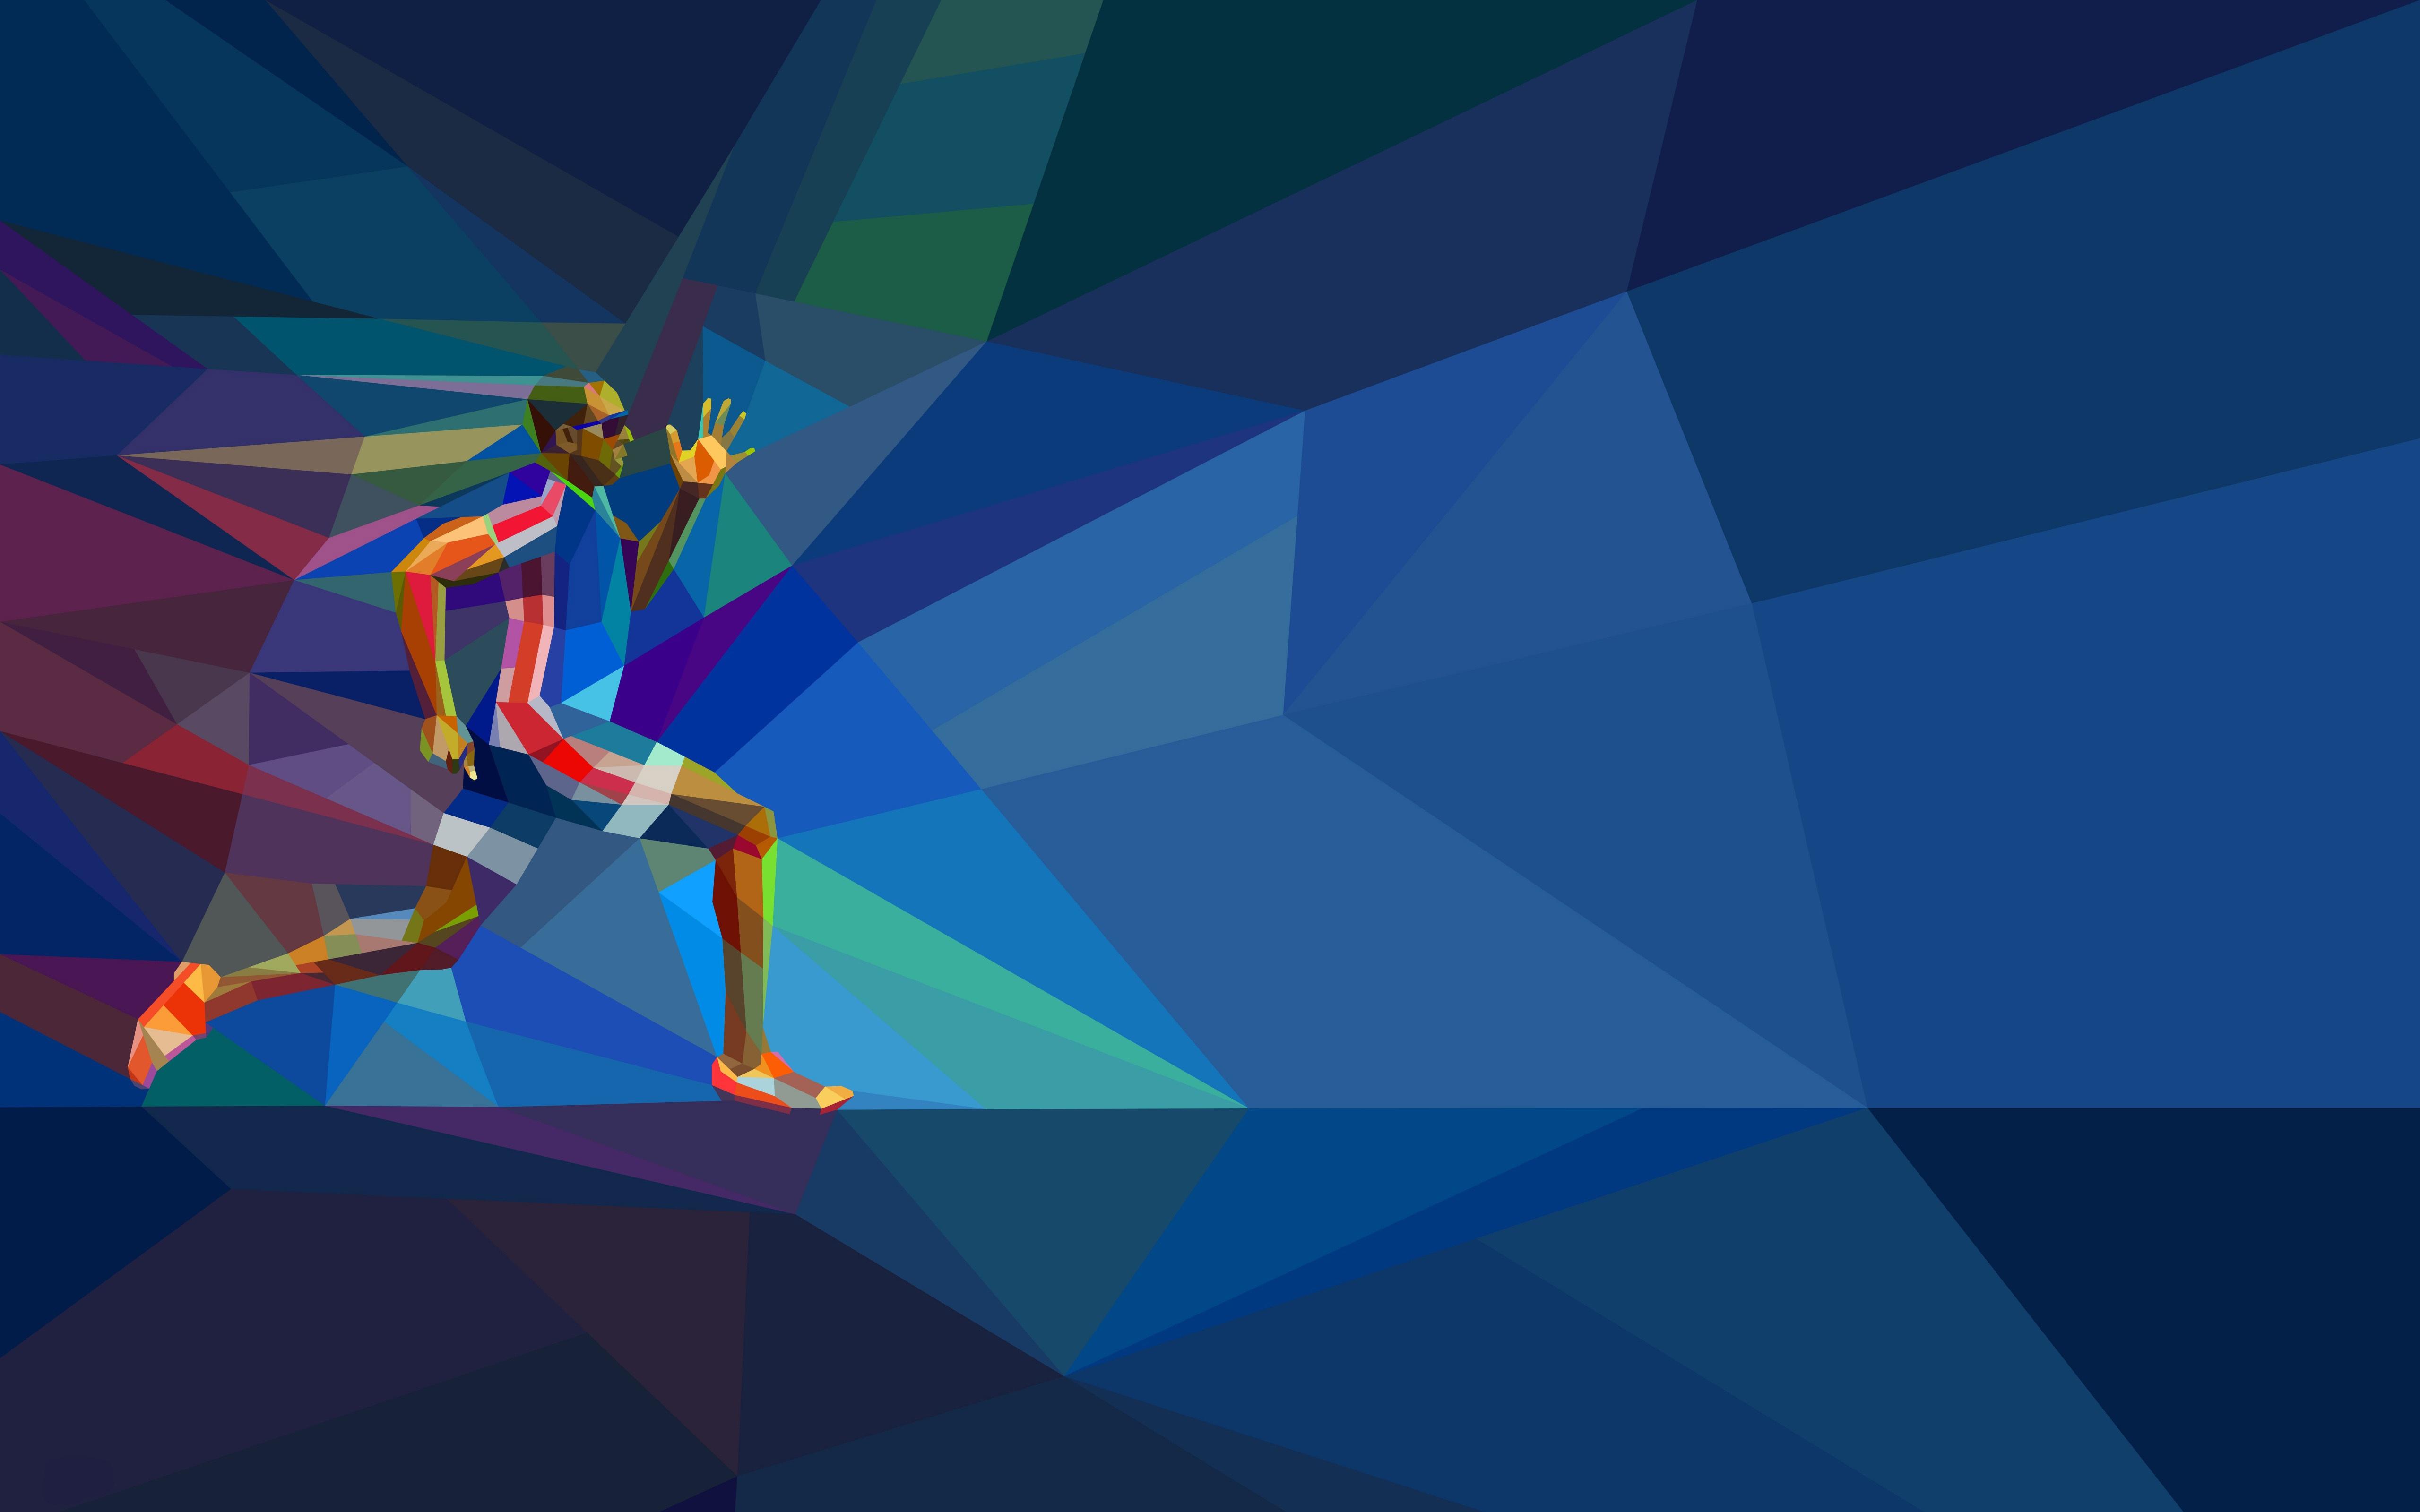 Athlete, Low Poly, Mosaic Art, HD, 4K, Sports